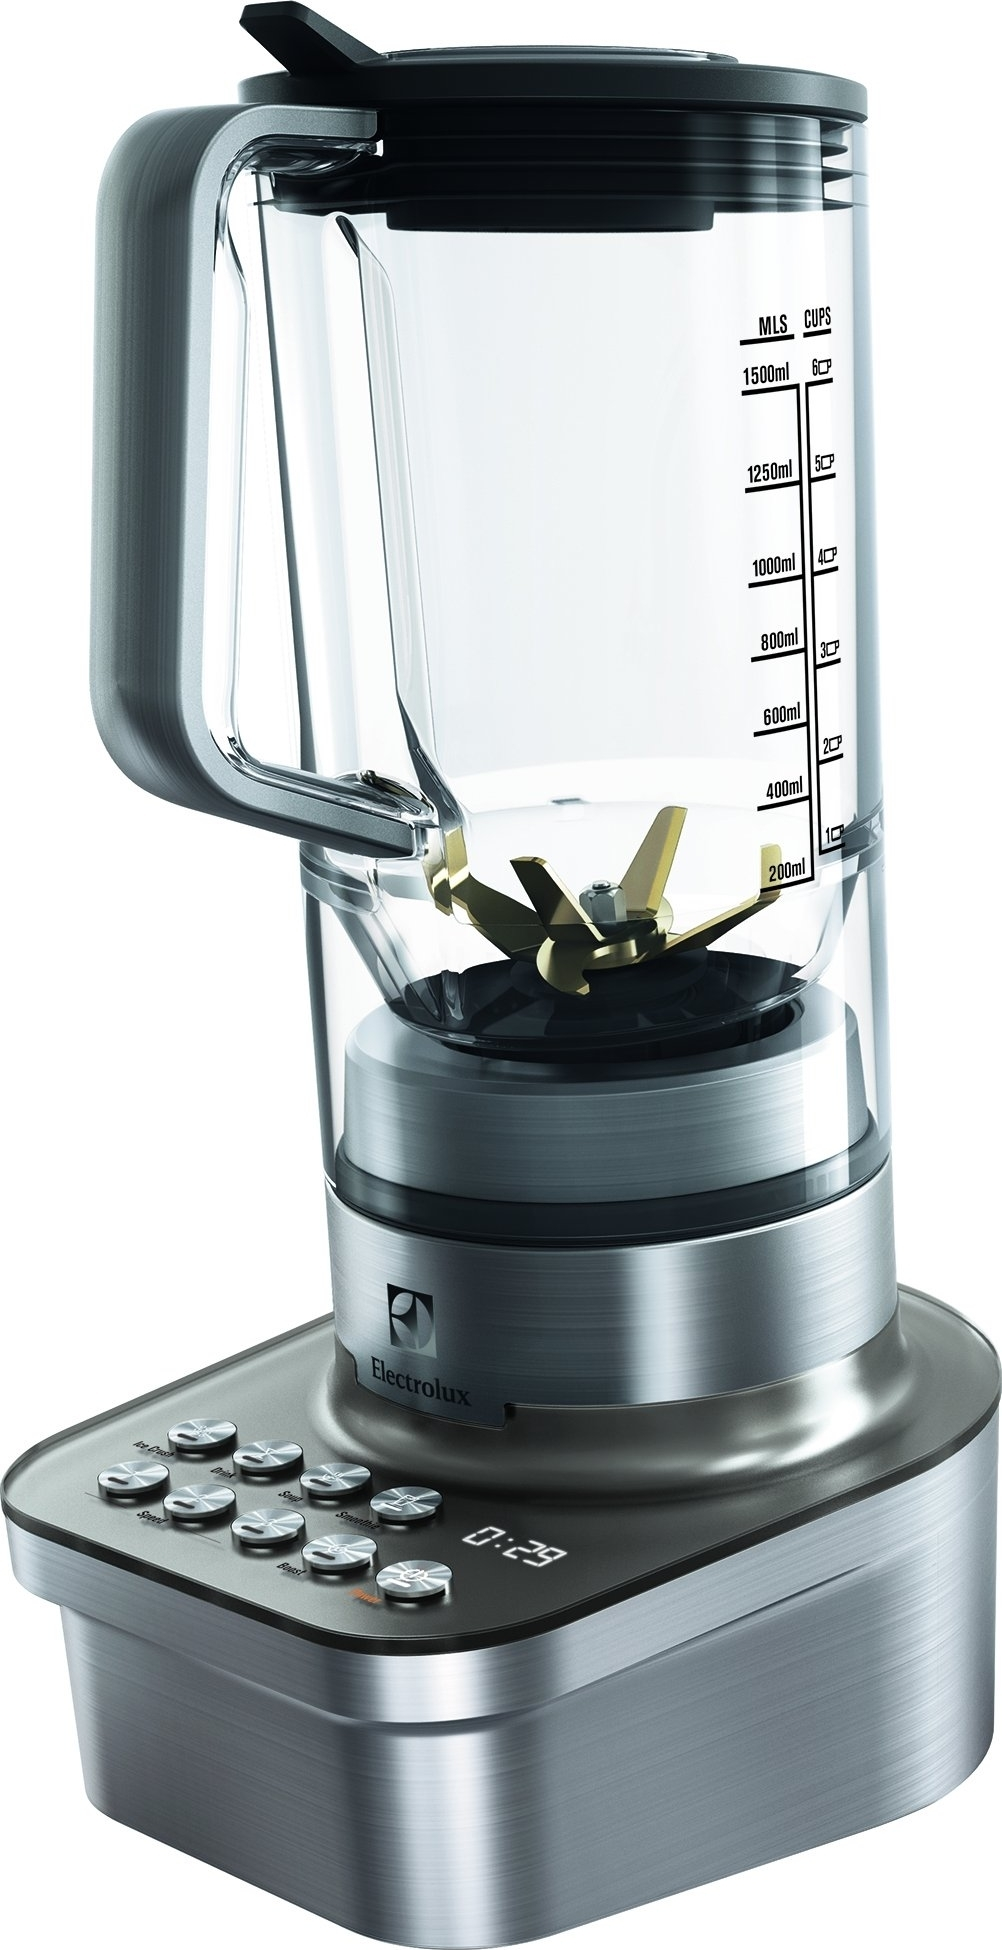 Electrolux ESB 9300